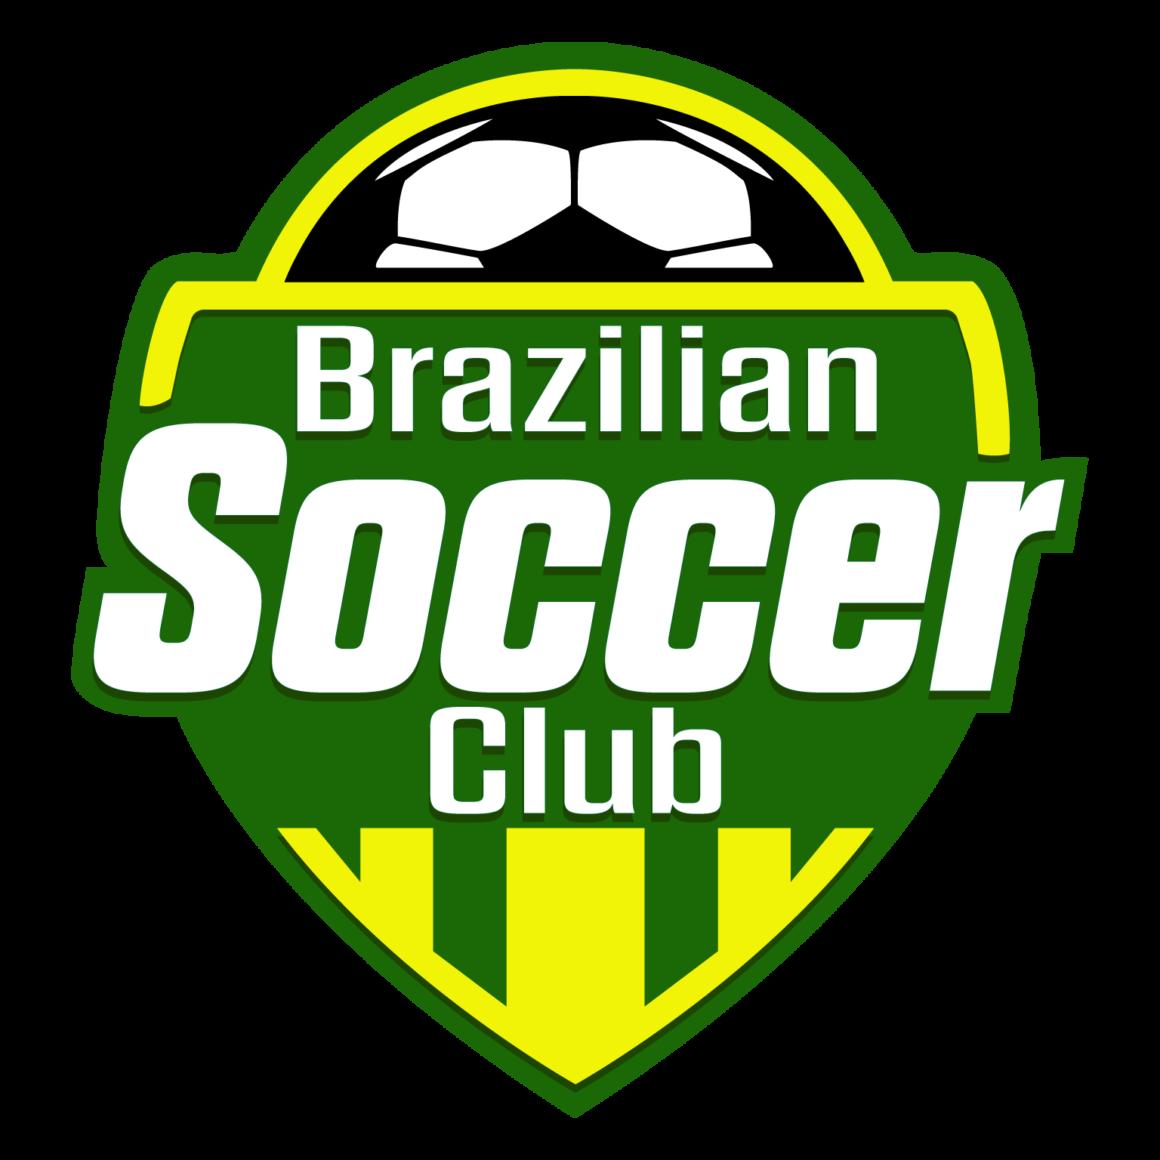 Brazilian Soccer Club